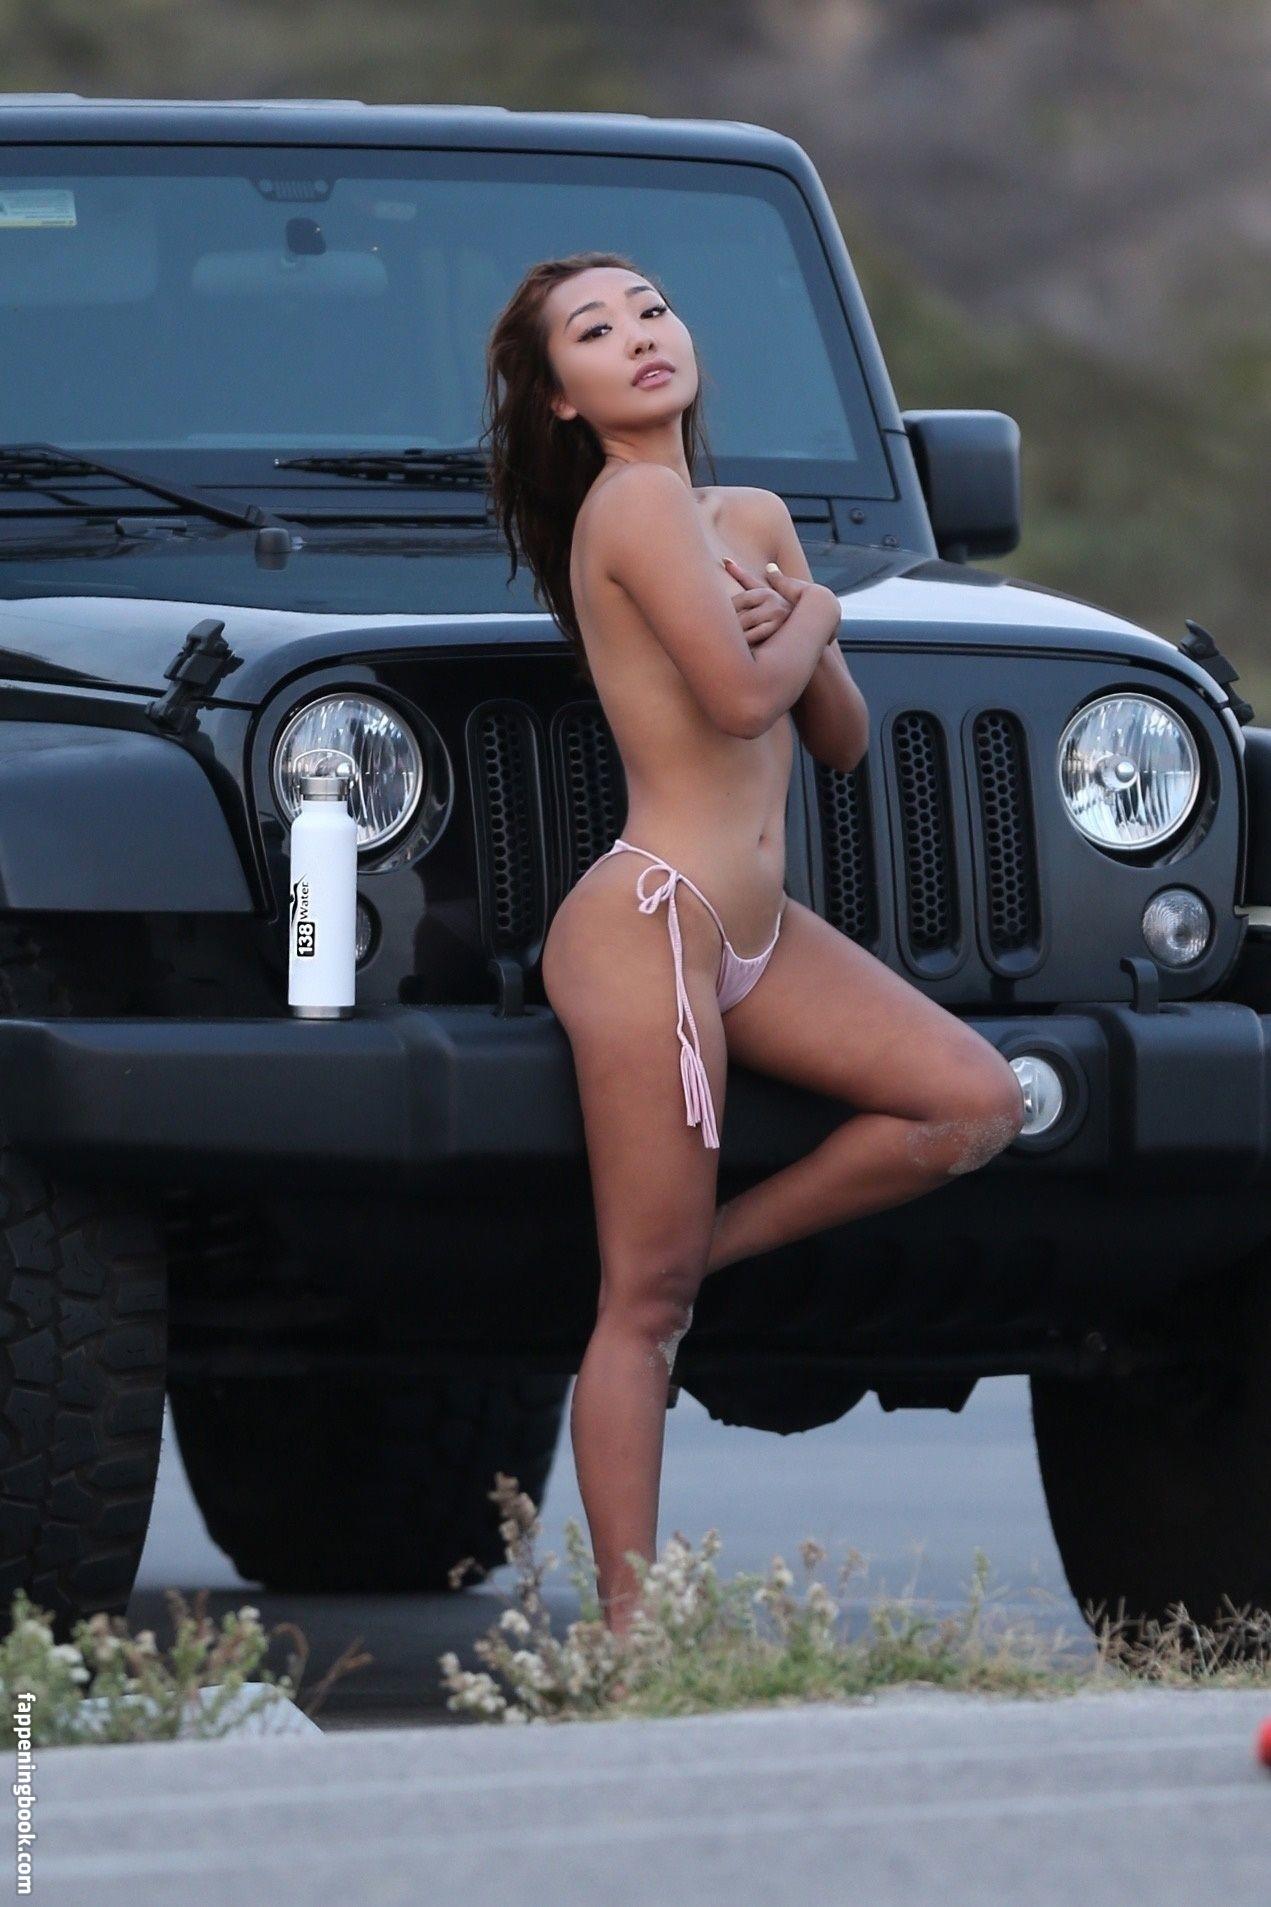 Nora Kyzy